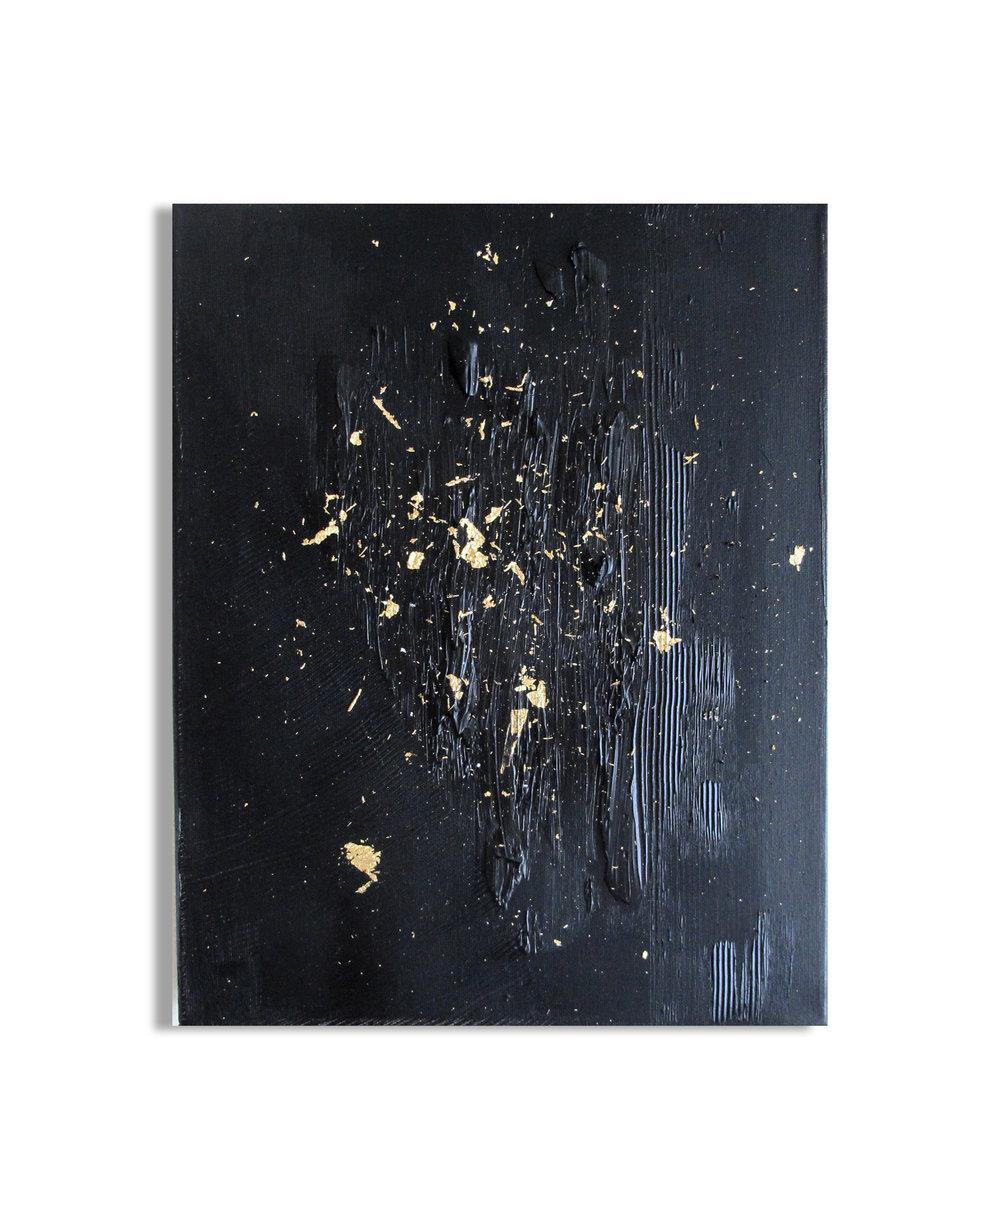 14 X 11 OIL / GOLD LEAF